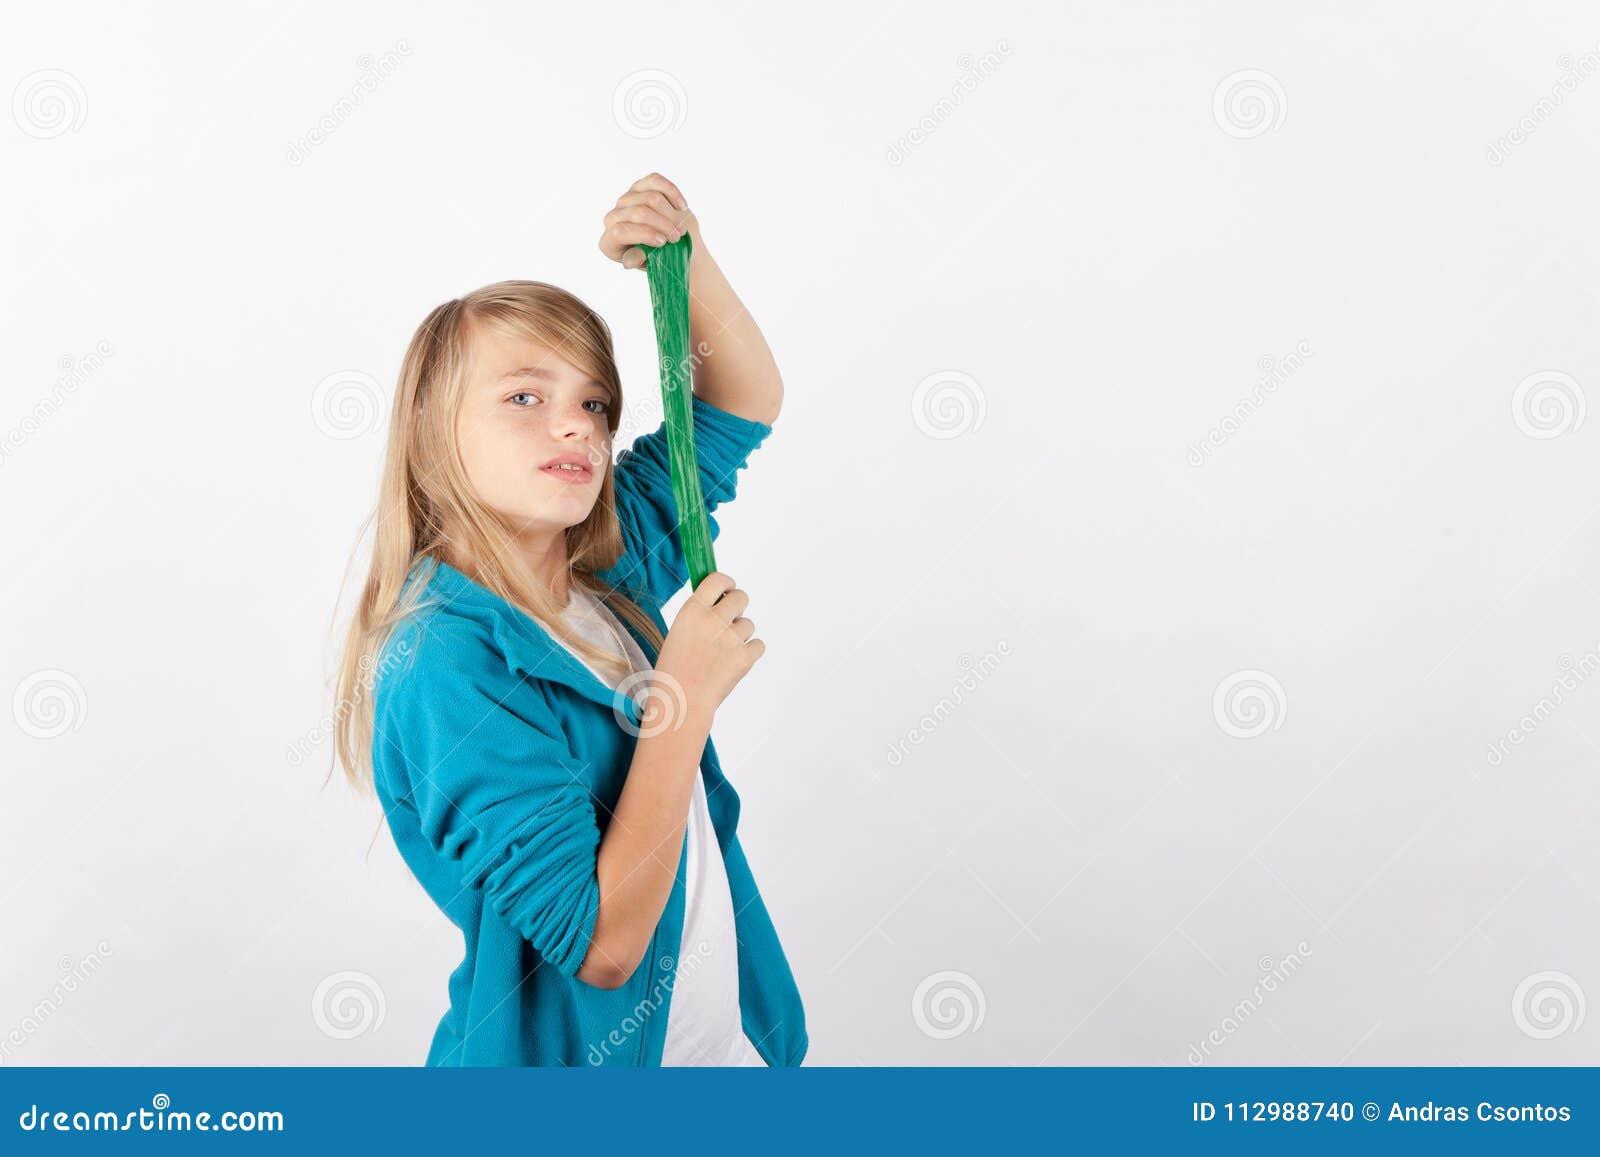 Cute girl posing with her handmade slime